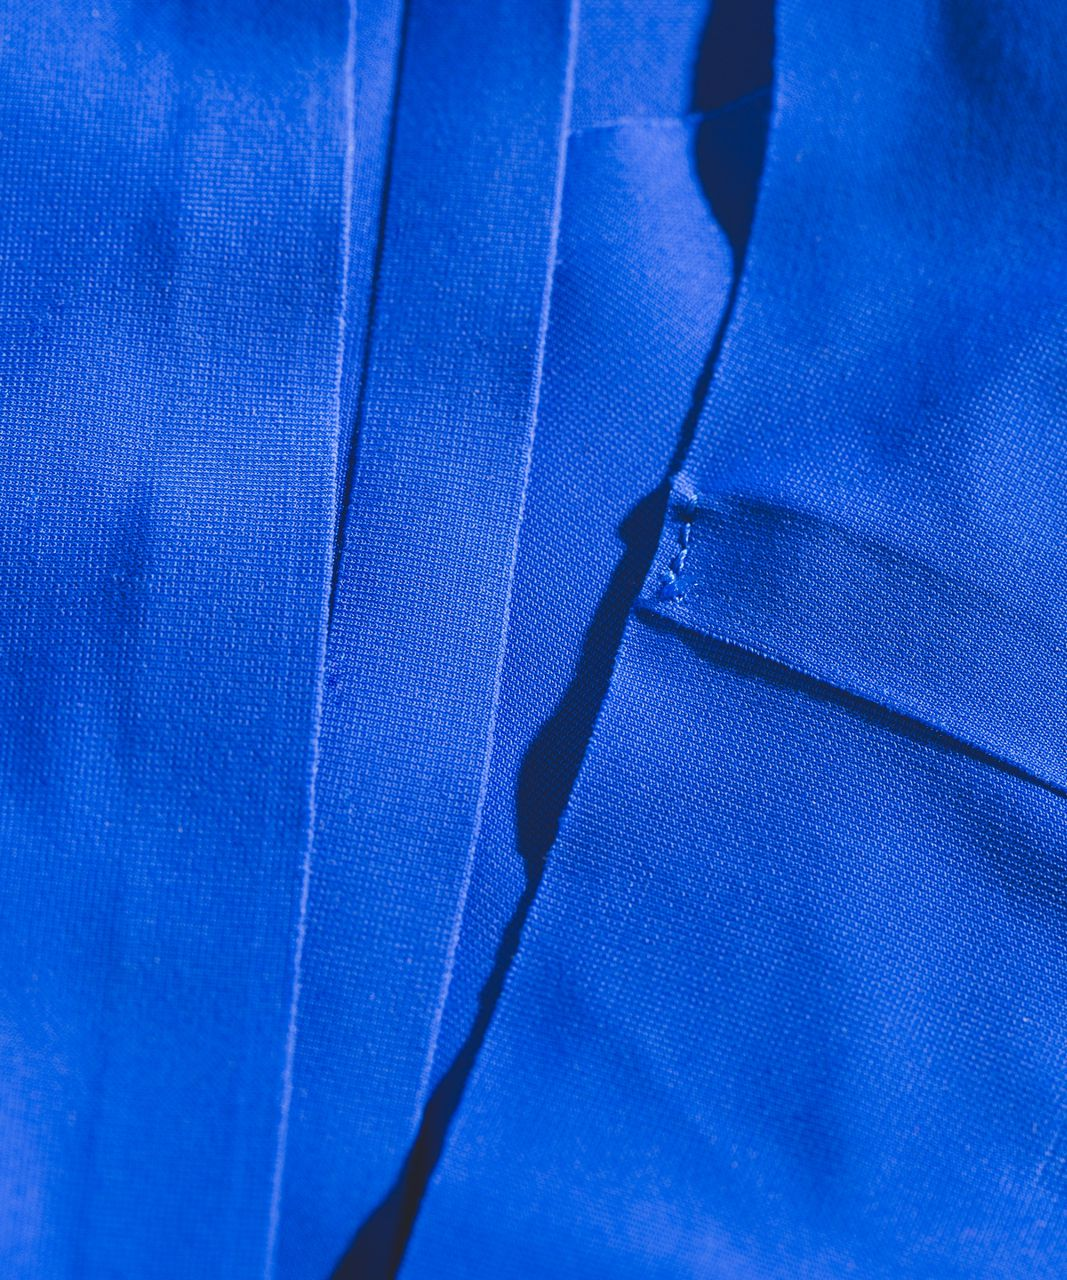 Lululemon Namastay Put Thong II - Cerulean Blue